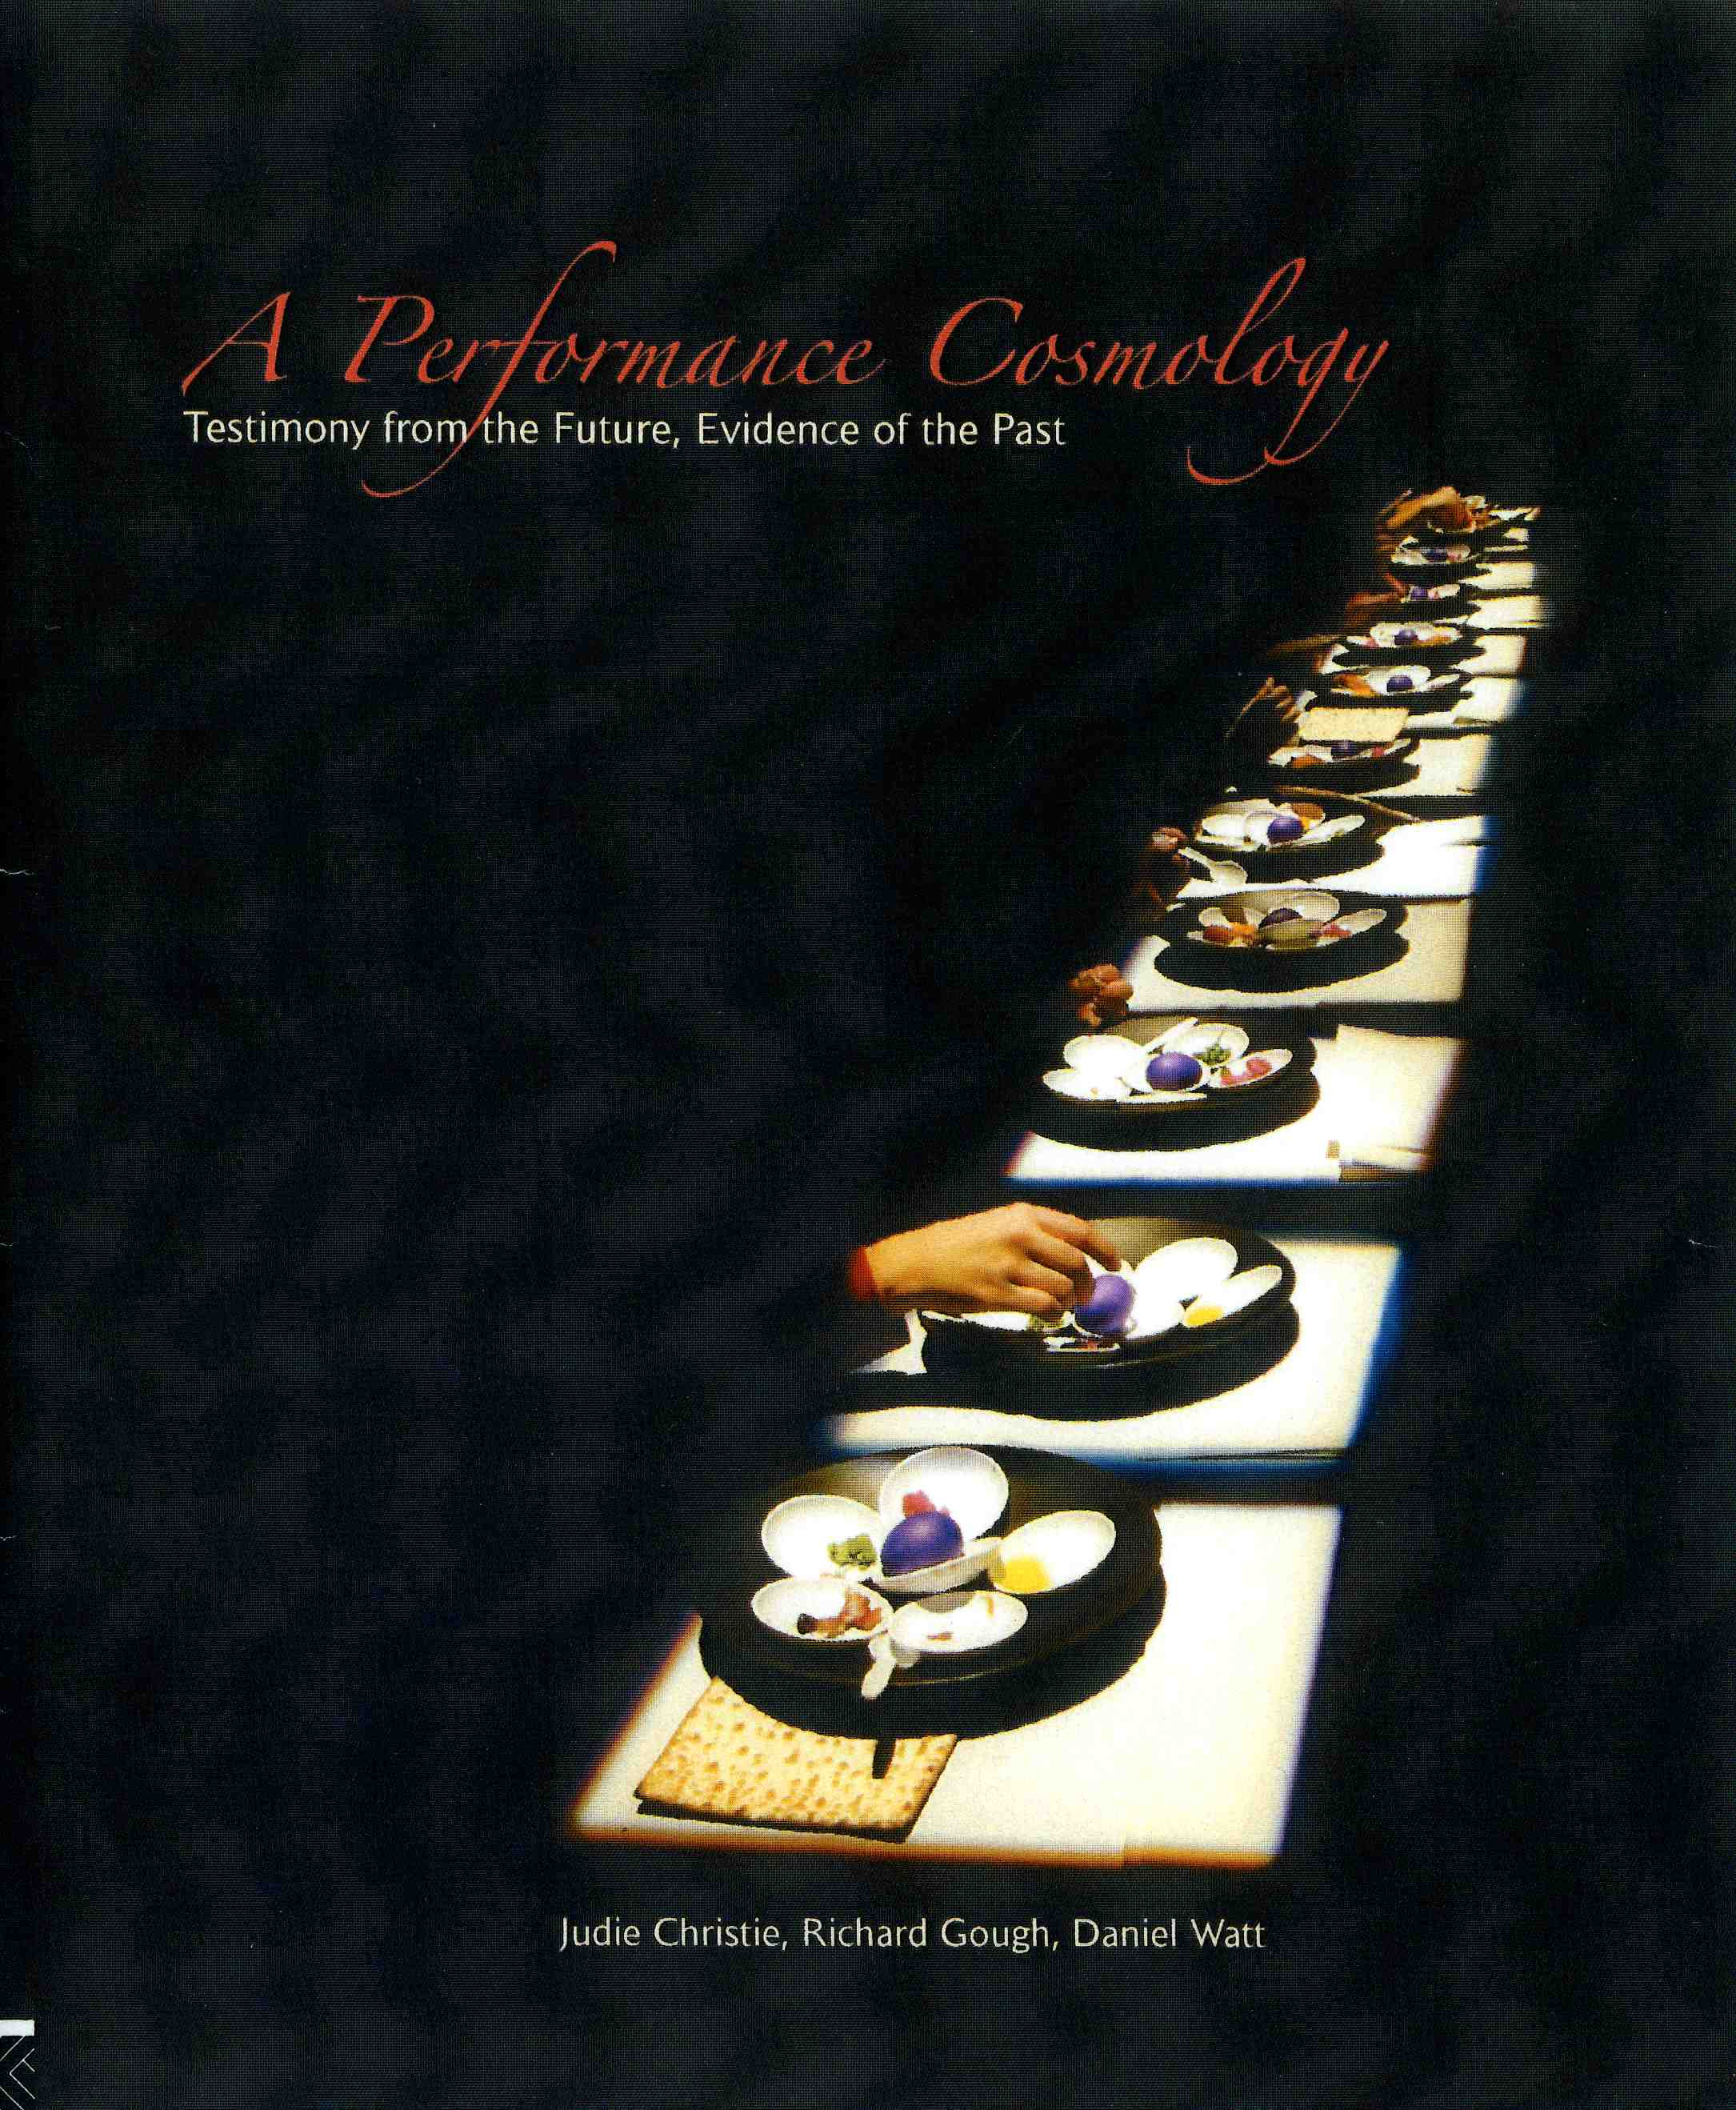 Performance Cosmology